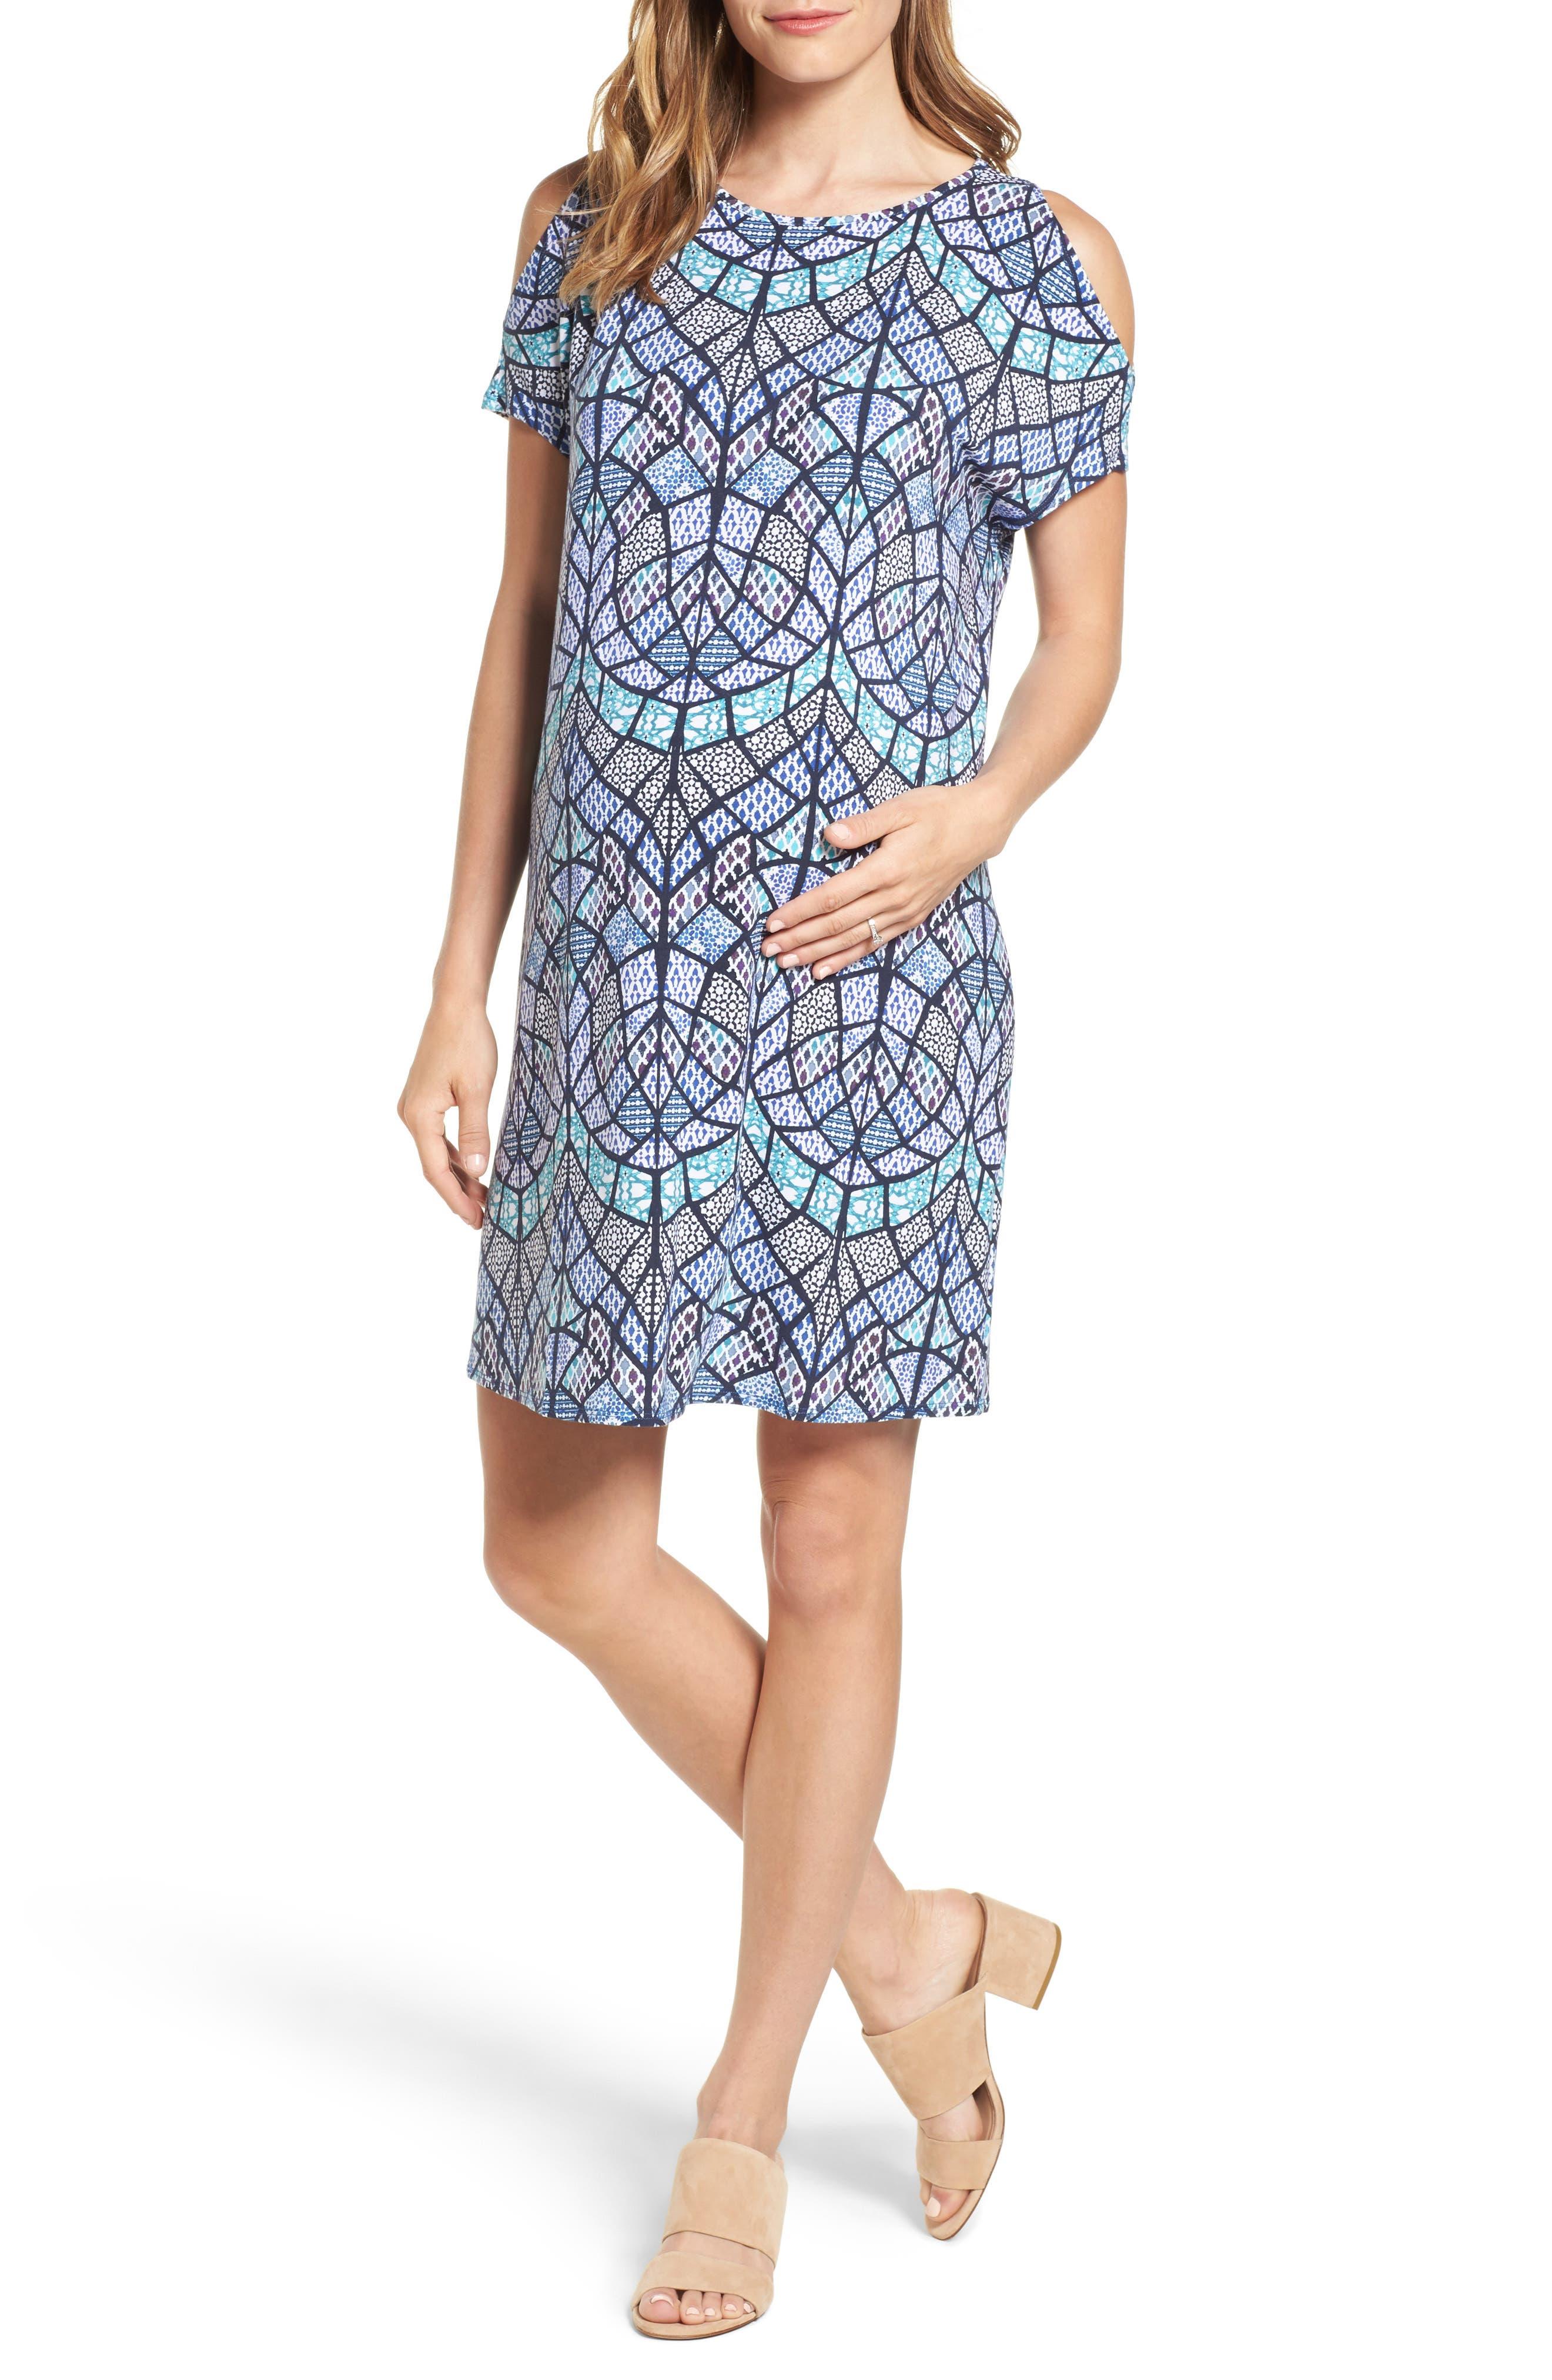 TART MATERNITY Caia Cold Shoulder Maternity Dress, Main, color, TILE MOSAIC